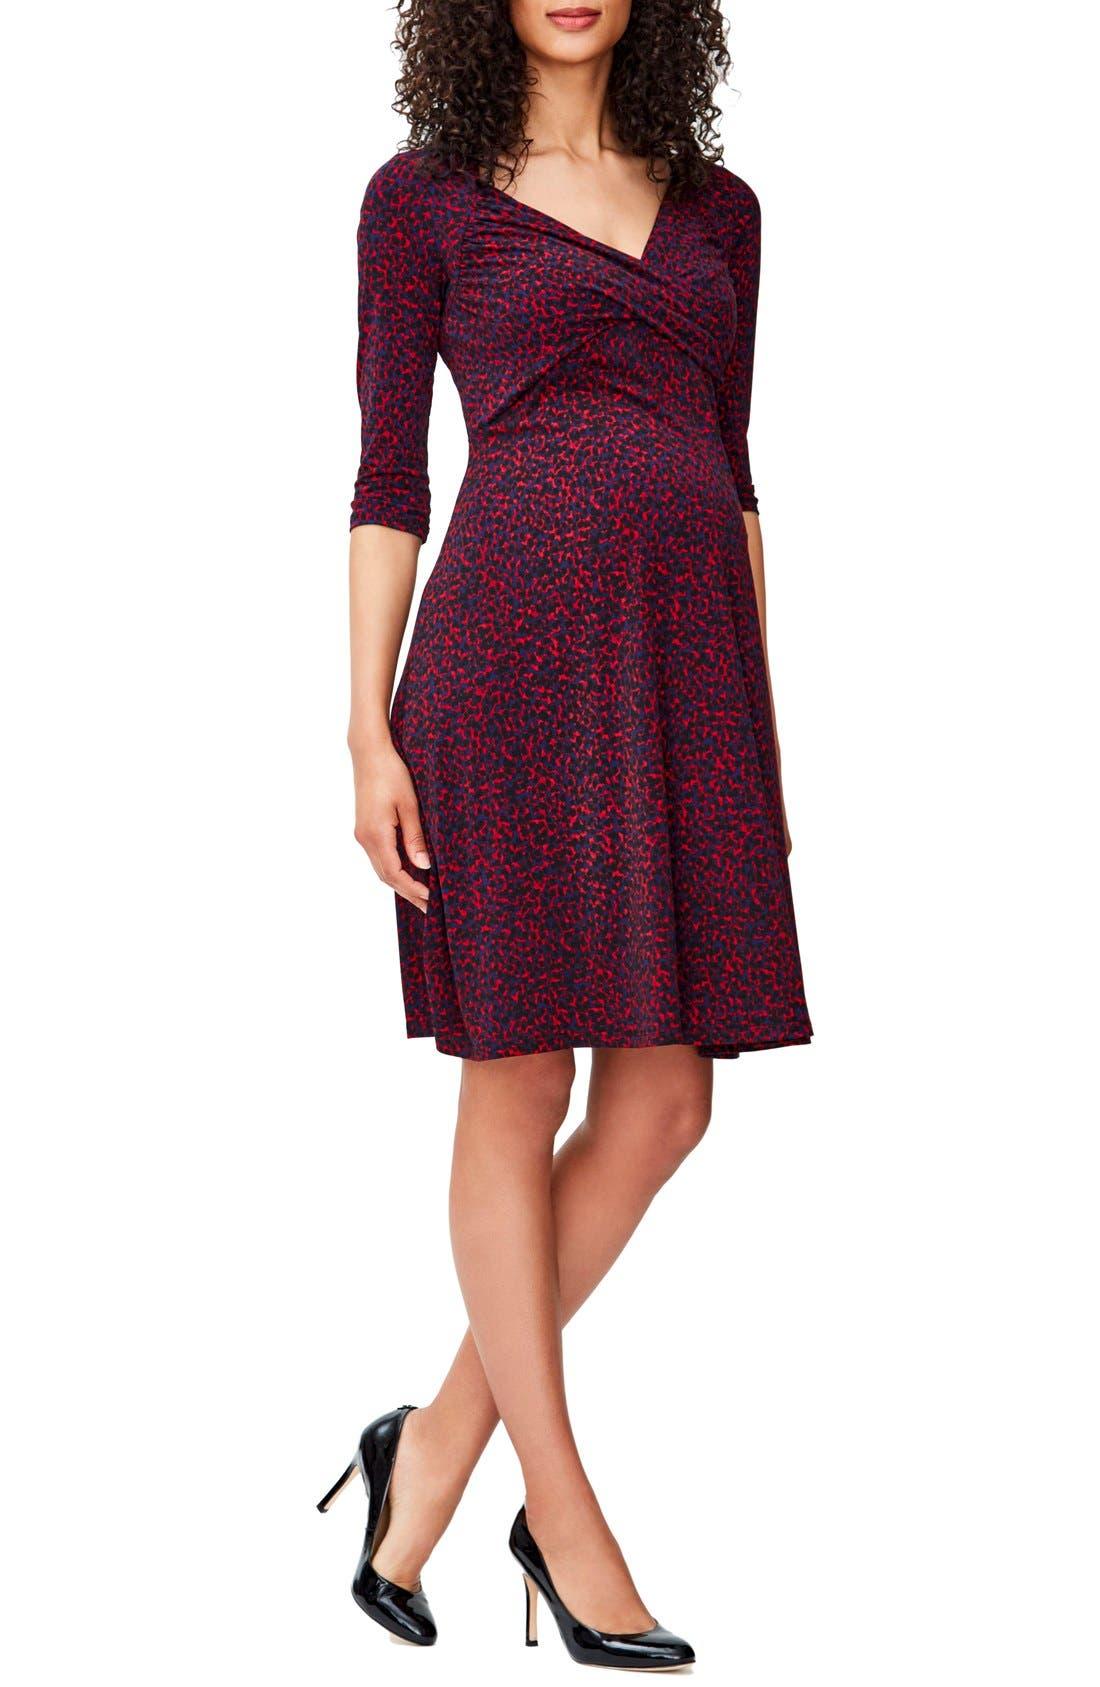 Main Image - Leota 'Sweetheart' Maternity Dress